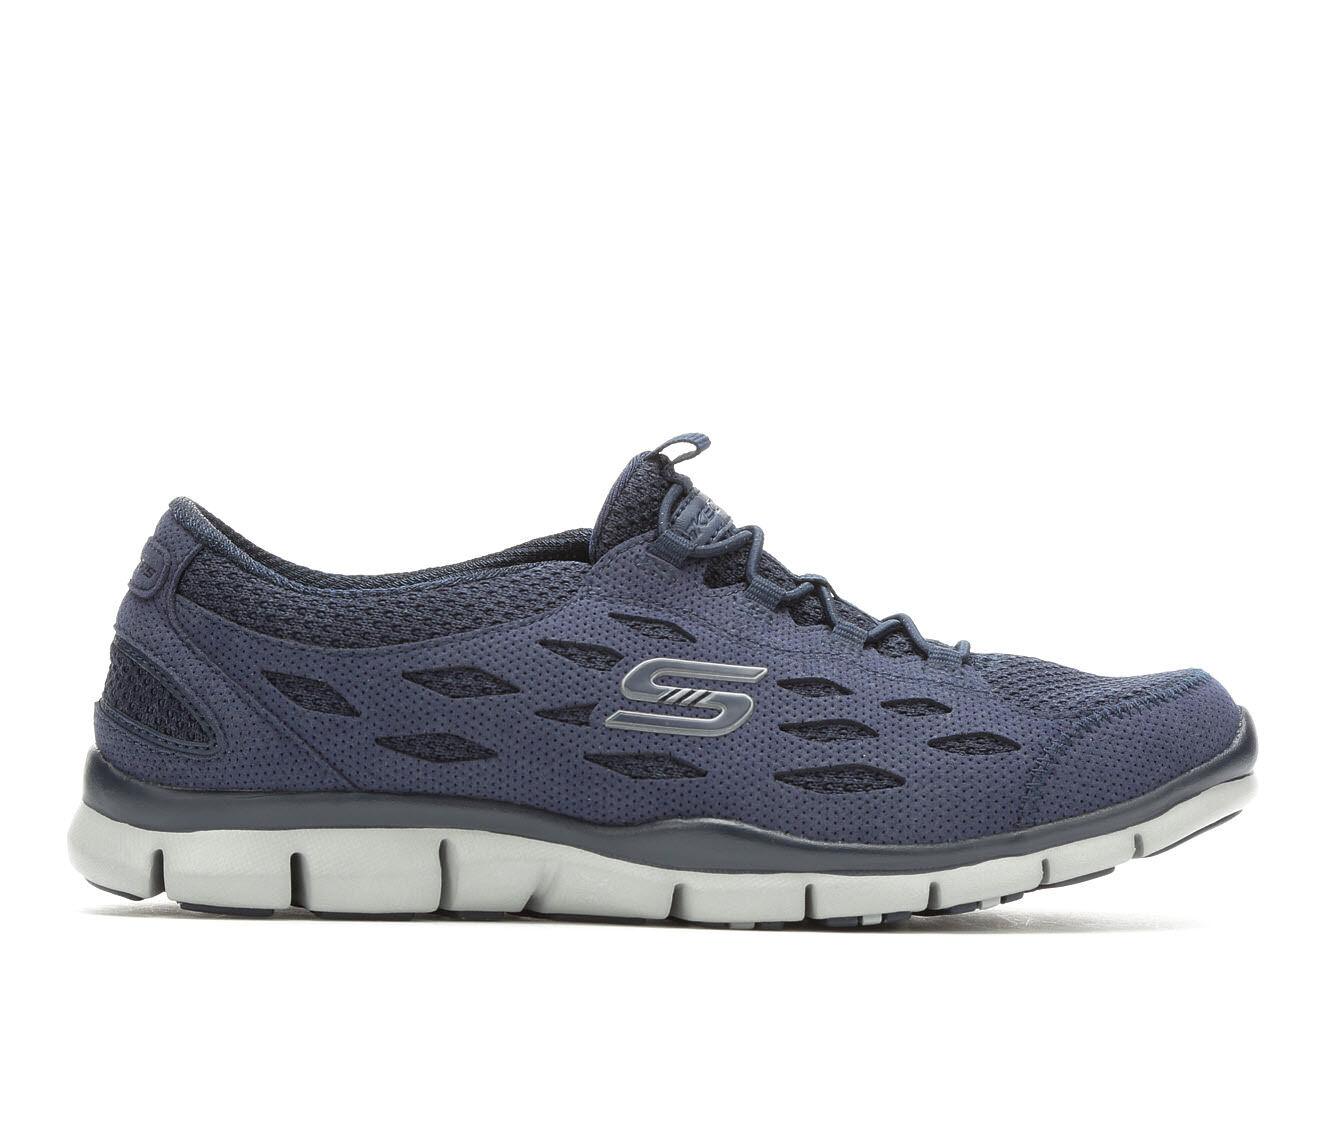 buy cheap new arrivals Women's Skechers Cozy N Carefree 22822 Slip-On Sneakers Dark Navy